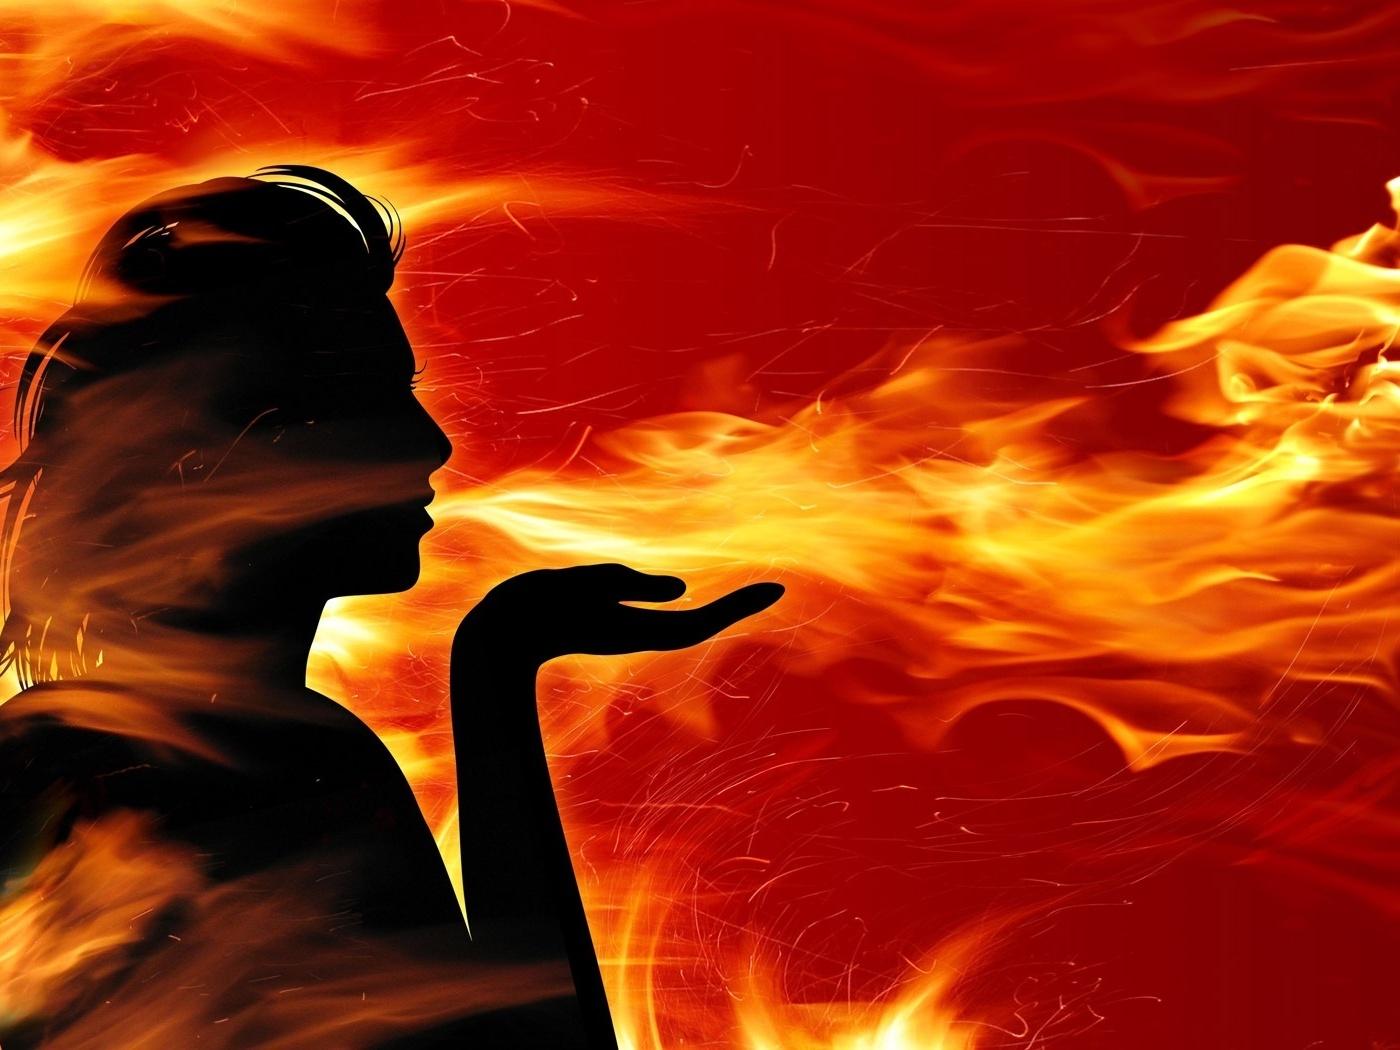 Тень девушки языки пламени огонь